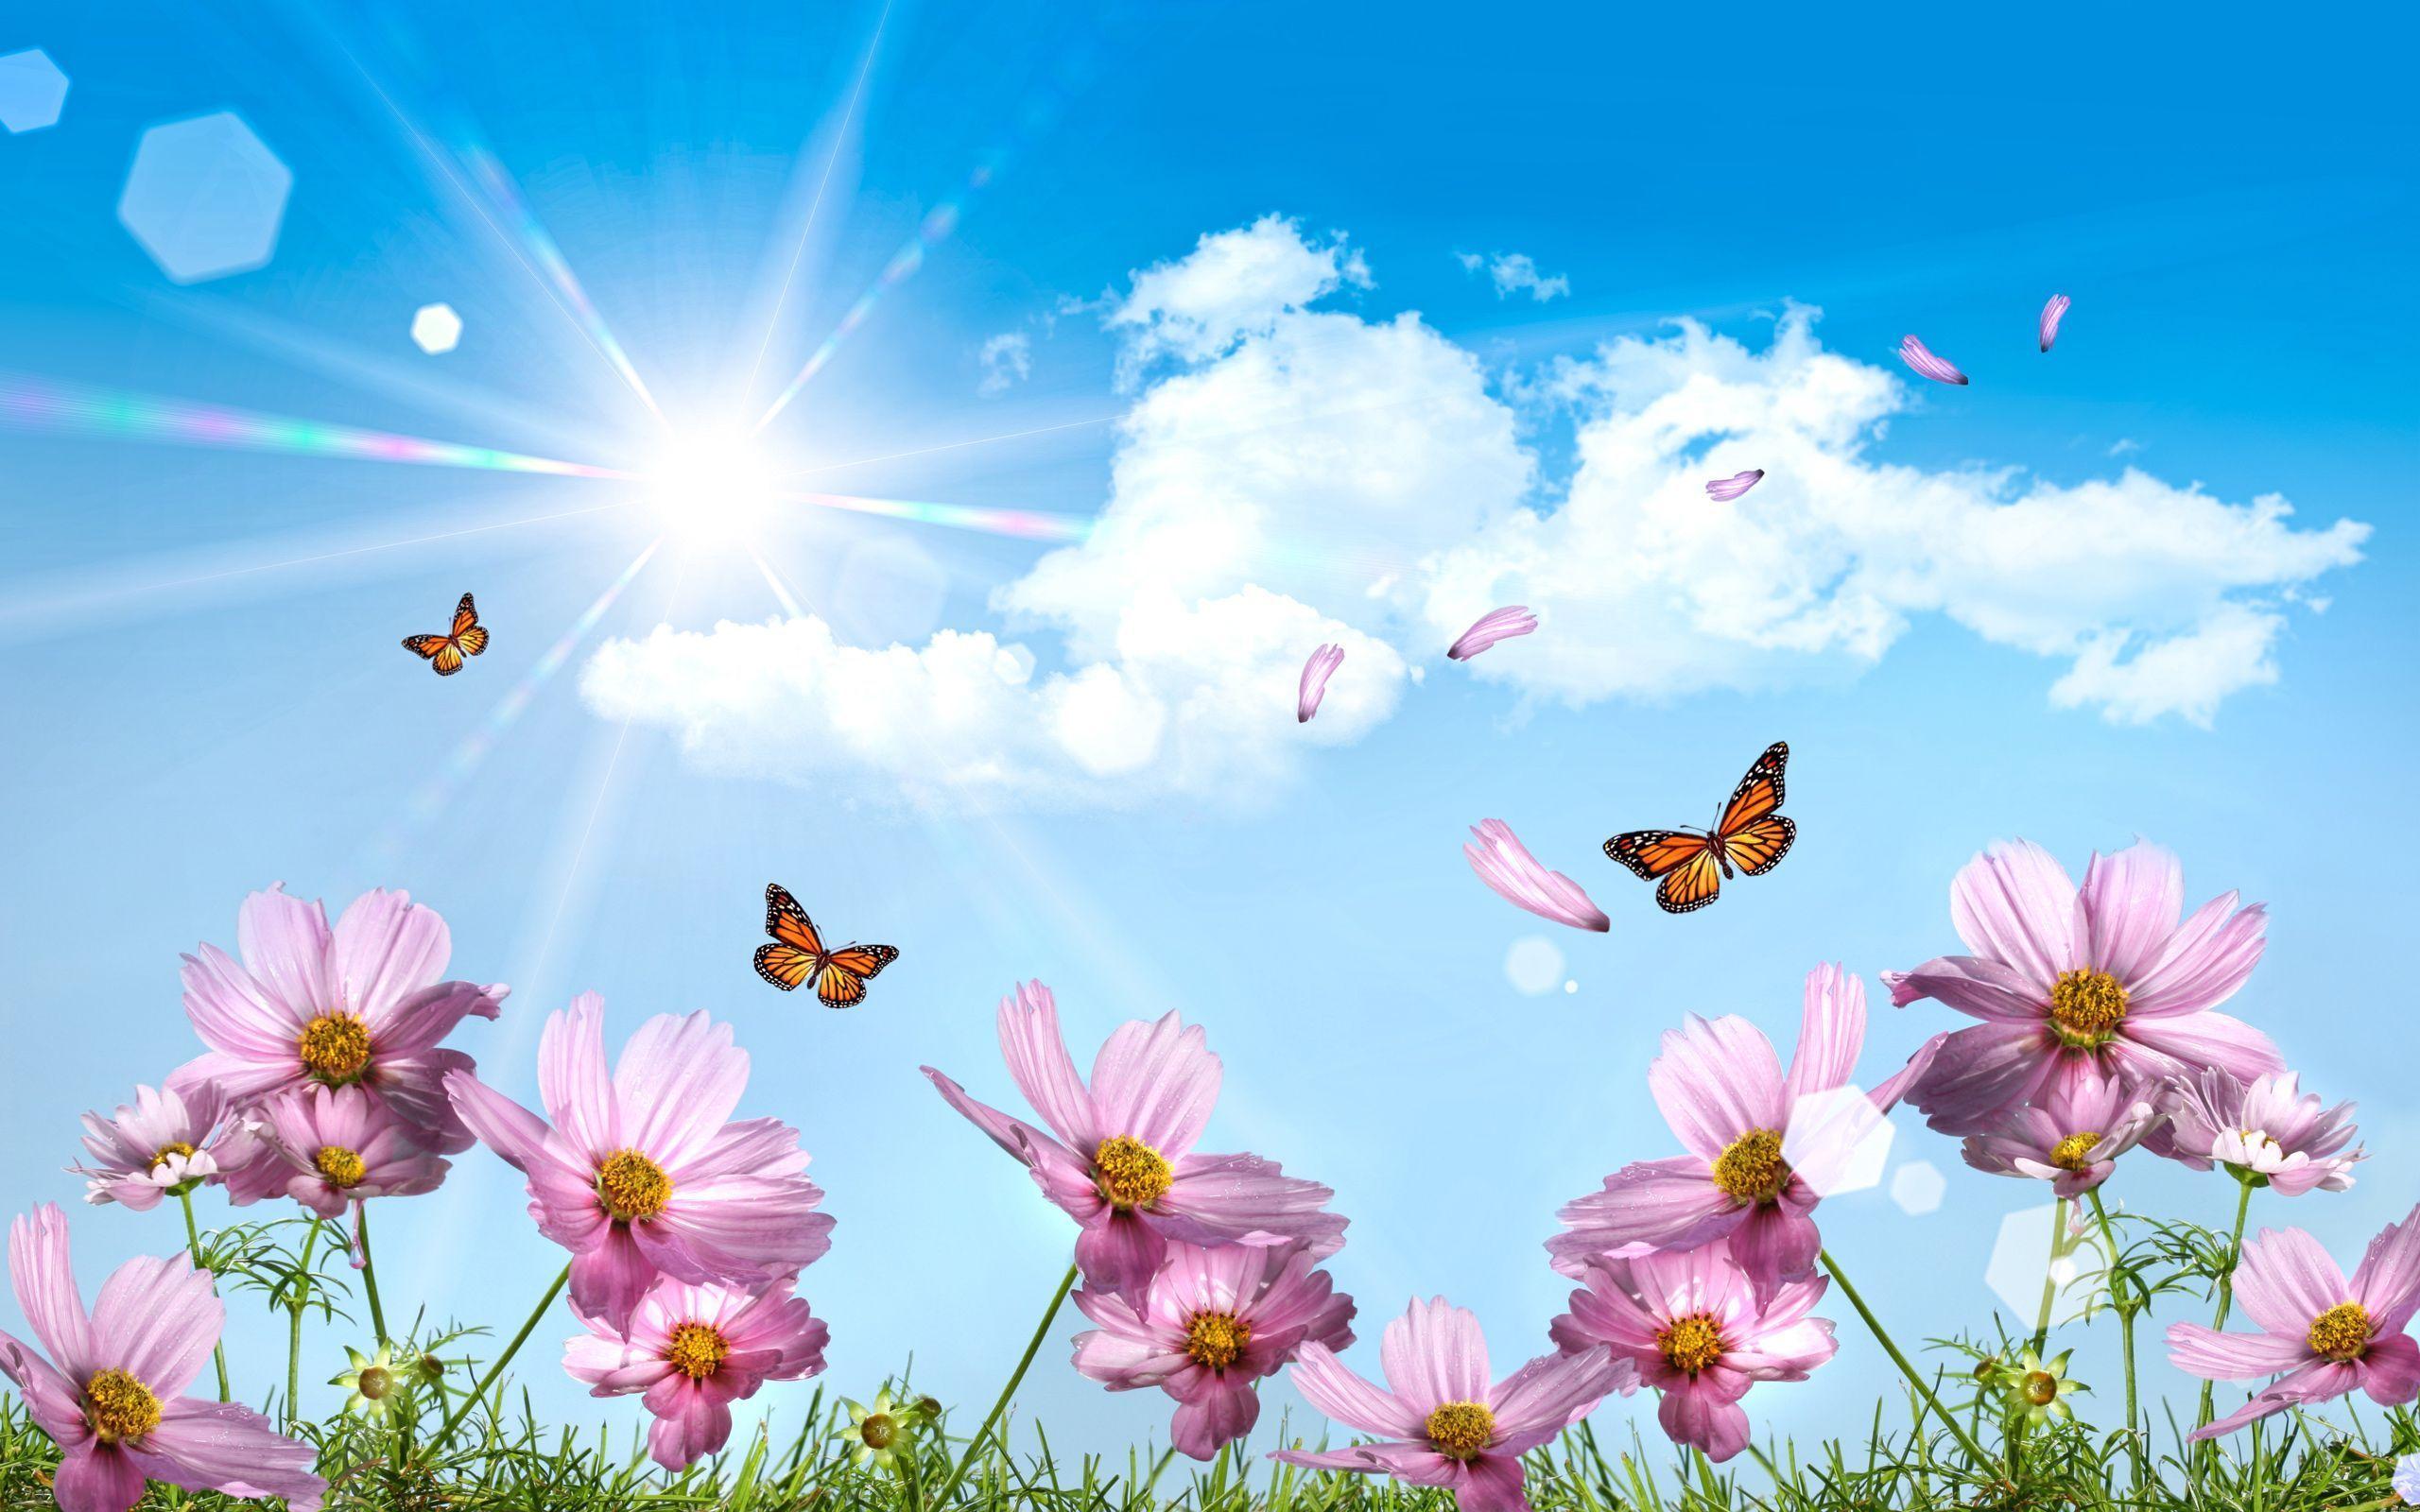 butterflies desktop wallpapers butterflies is the really beautiful designs free butterfly wallpaperbutterflies wallpapers and backgrounds